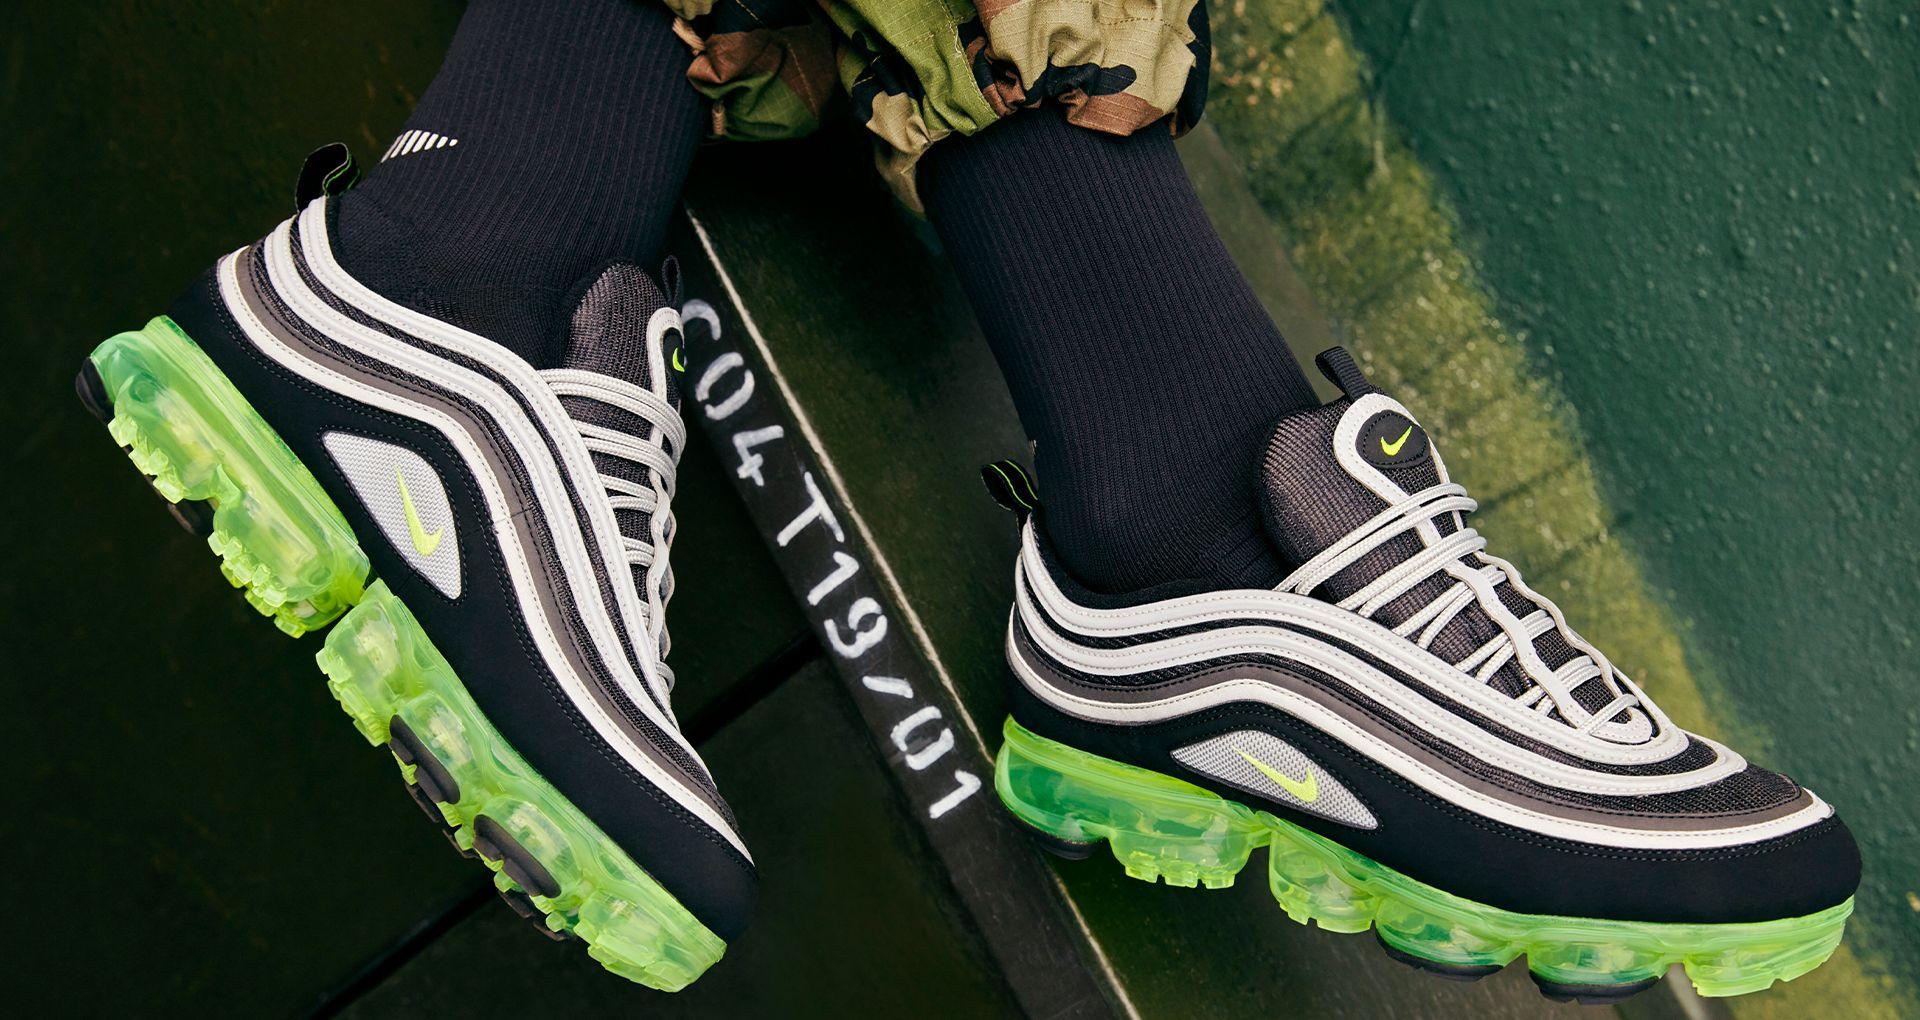 c93b87447b7 Nike Air Vapormax 97  Black   Volt   Metallic Silver  Release Date ...